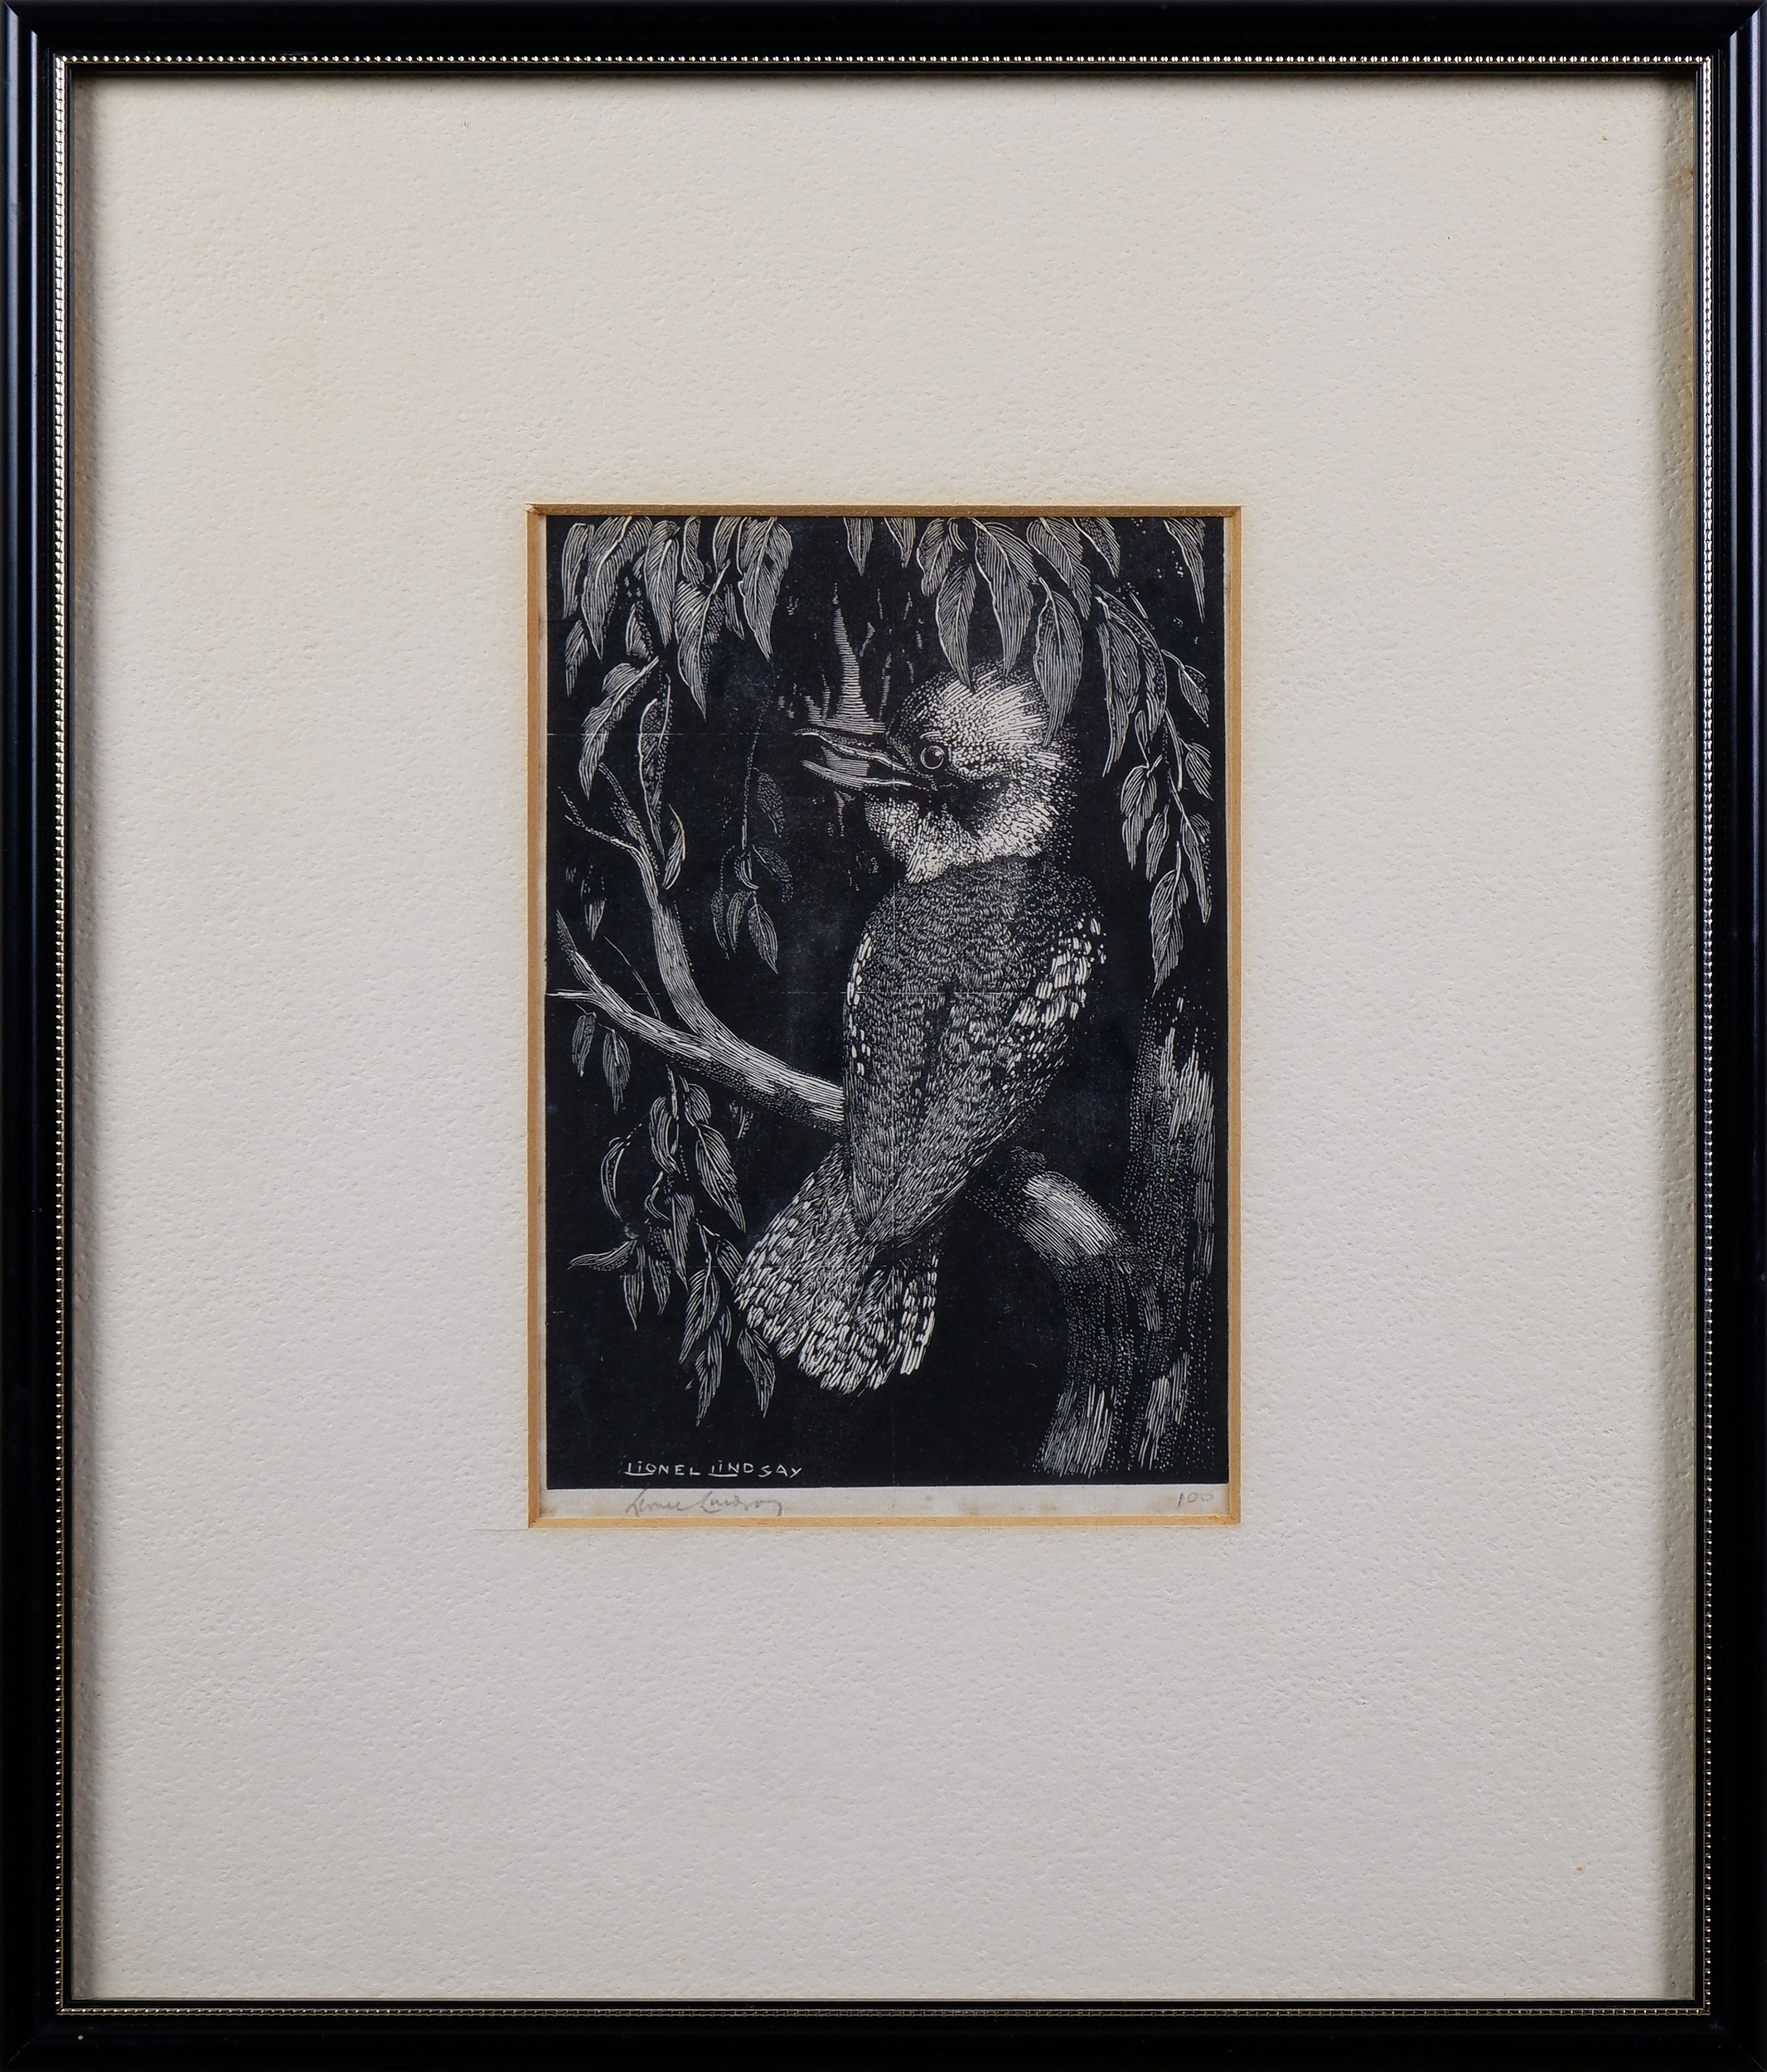 'Lionel Lindsay (1874-1961), The Kookaburra 1923, Woodcut'